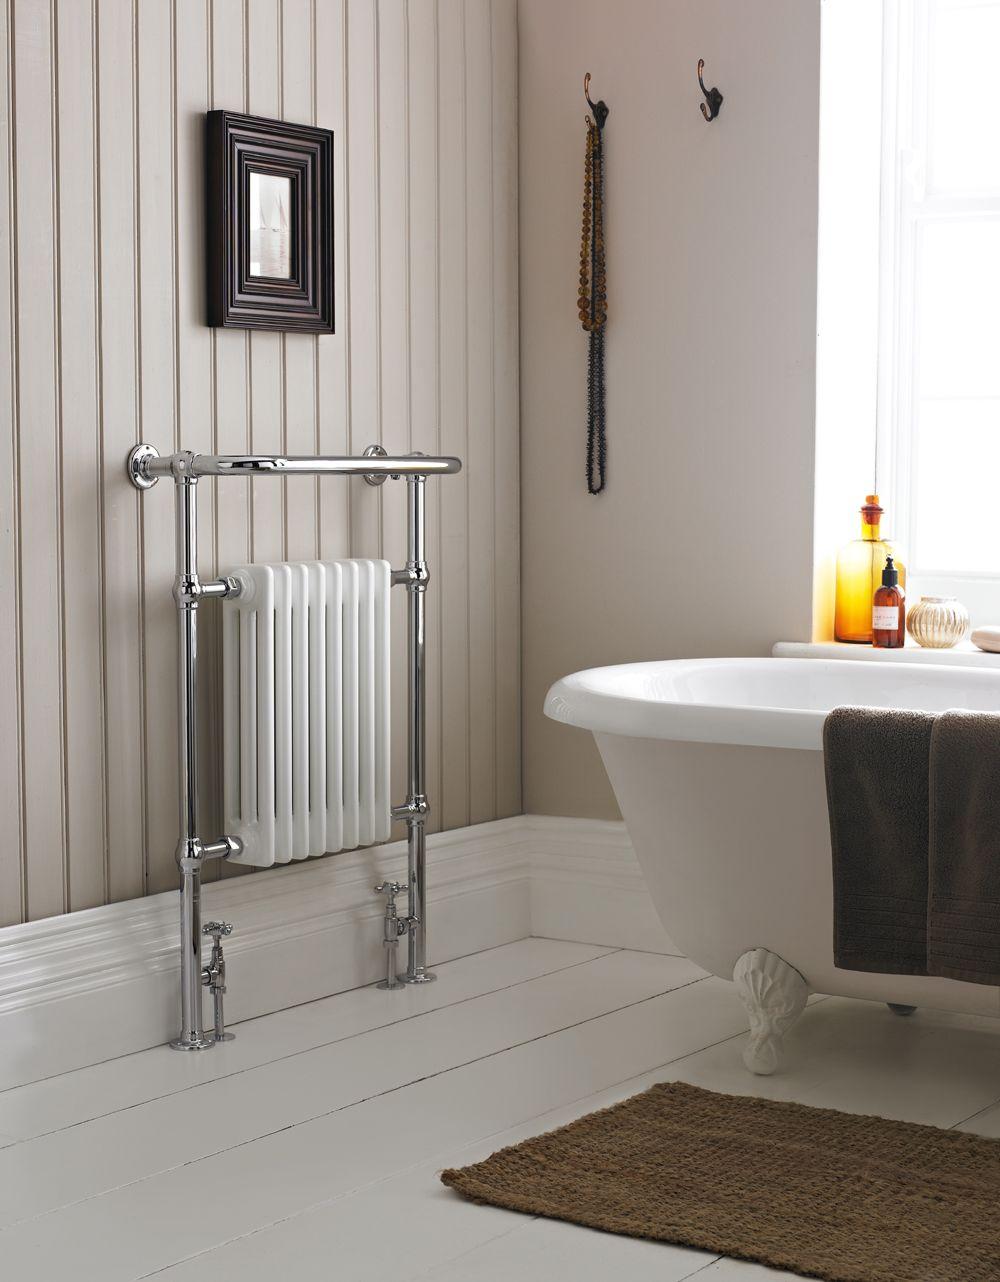 Small heated towel rails for bathrooms - Savoy Traditional Heated Towel Rail Radiator